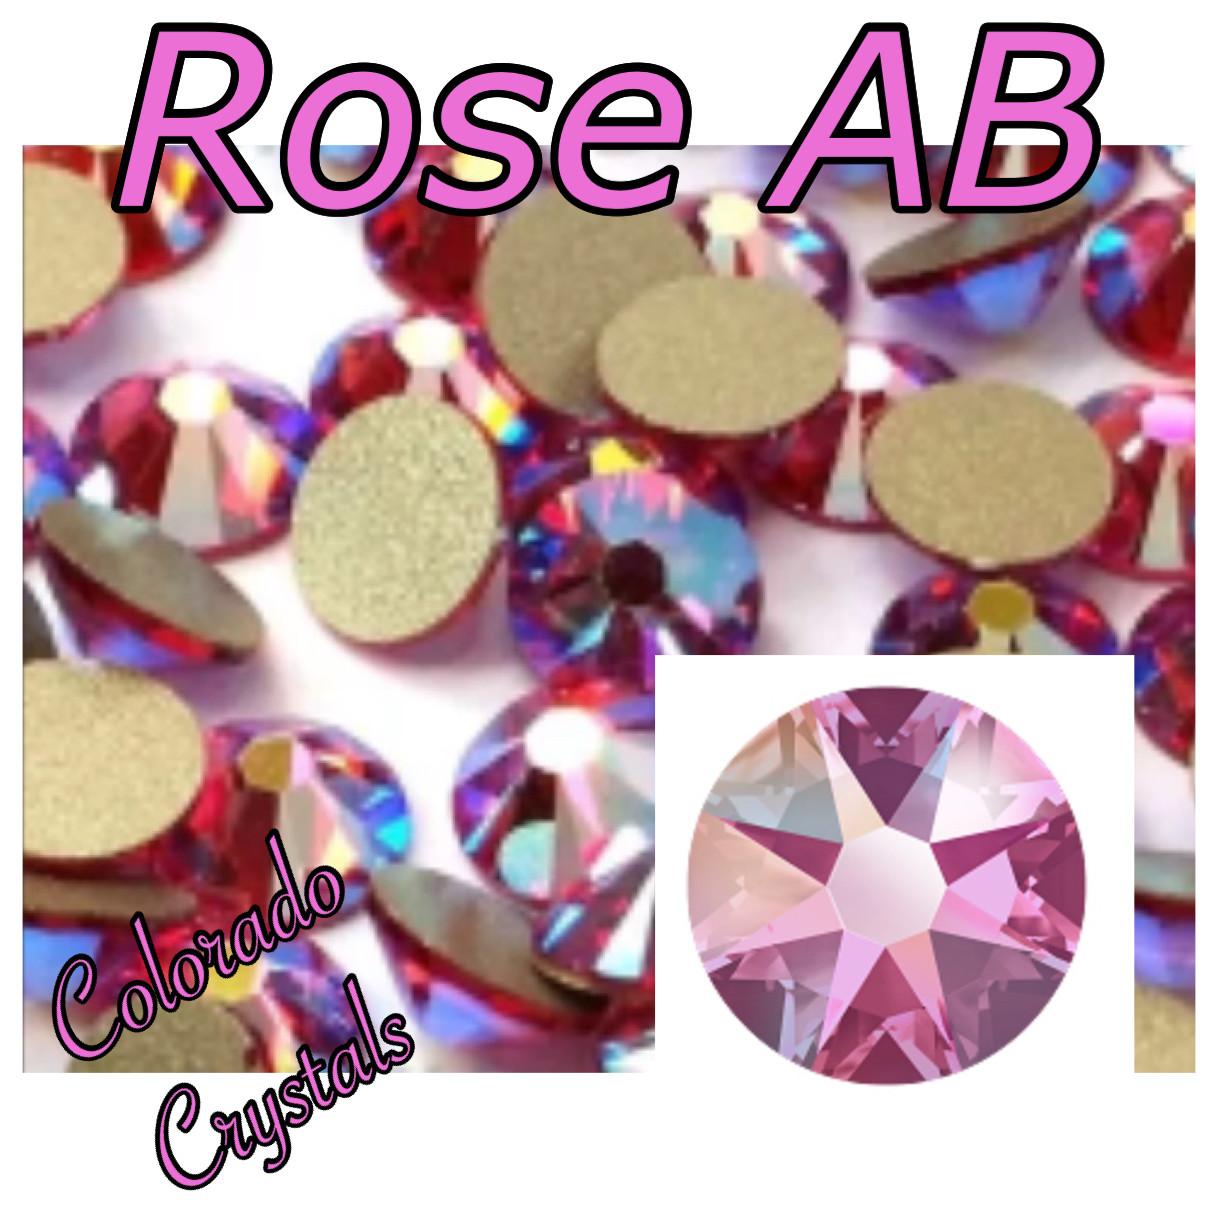 Rose AB 7ss 2058 Limited Pink Swarovski Rhinestones